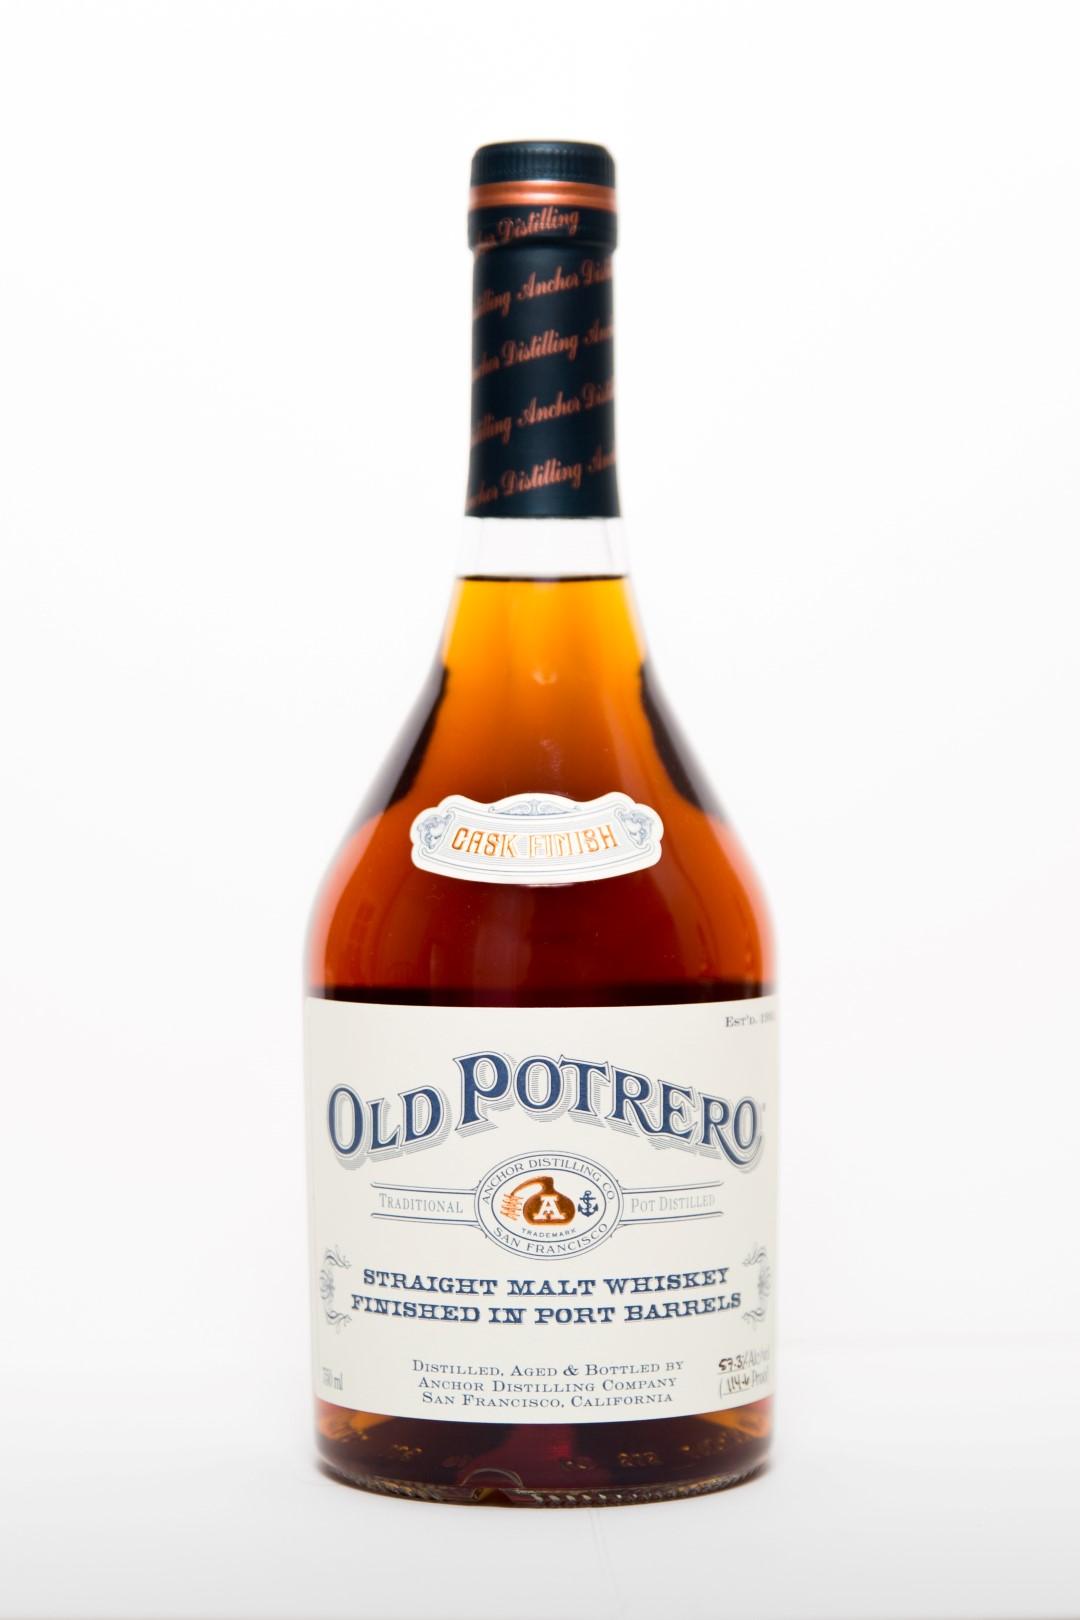 Anchor Distilling Old Potrero Straight Malt Whiskey Finished in Port Barrels